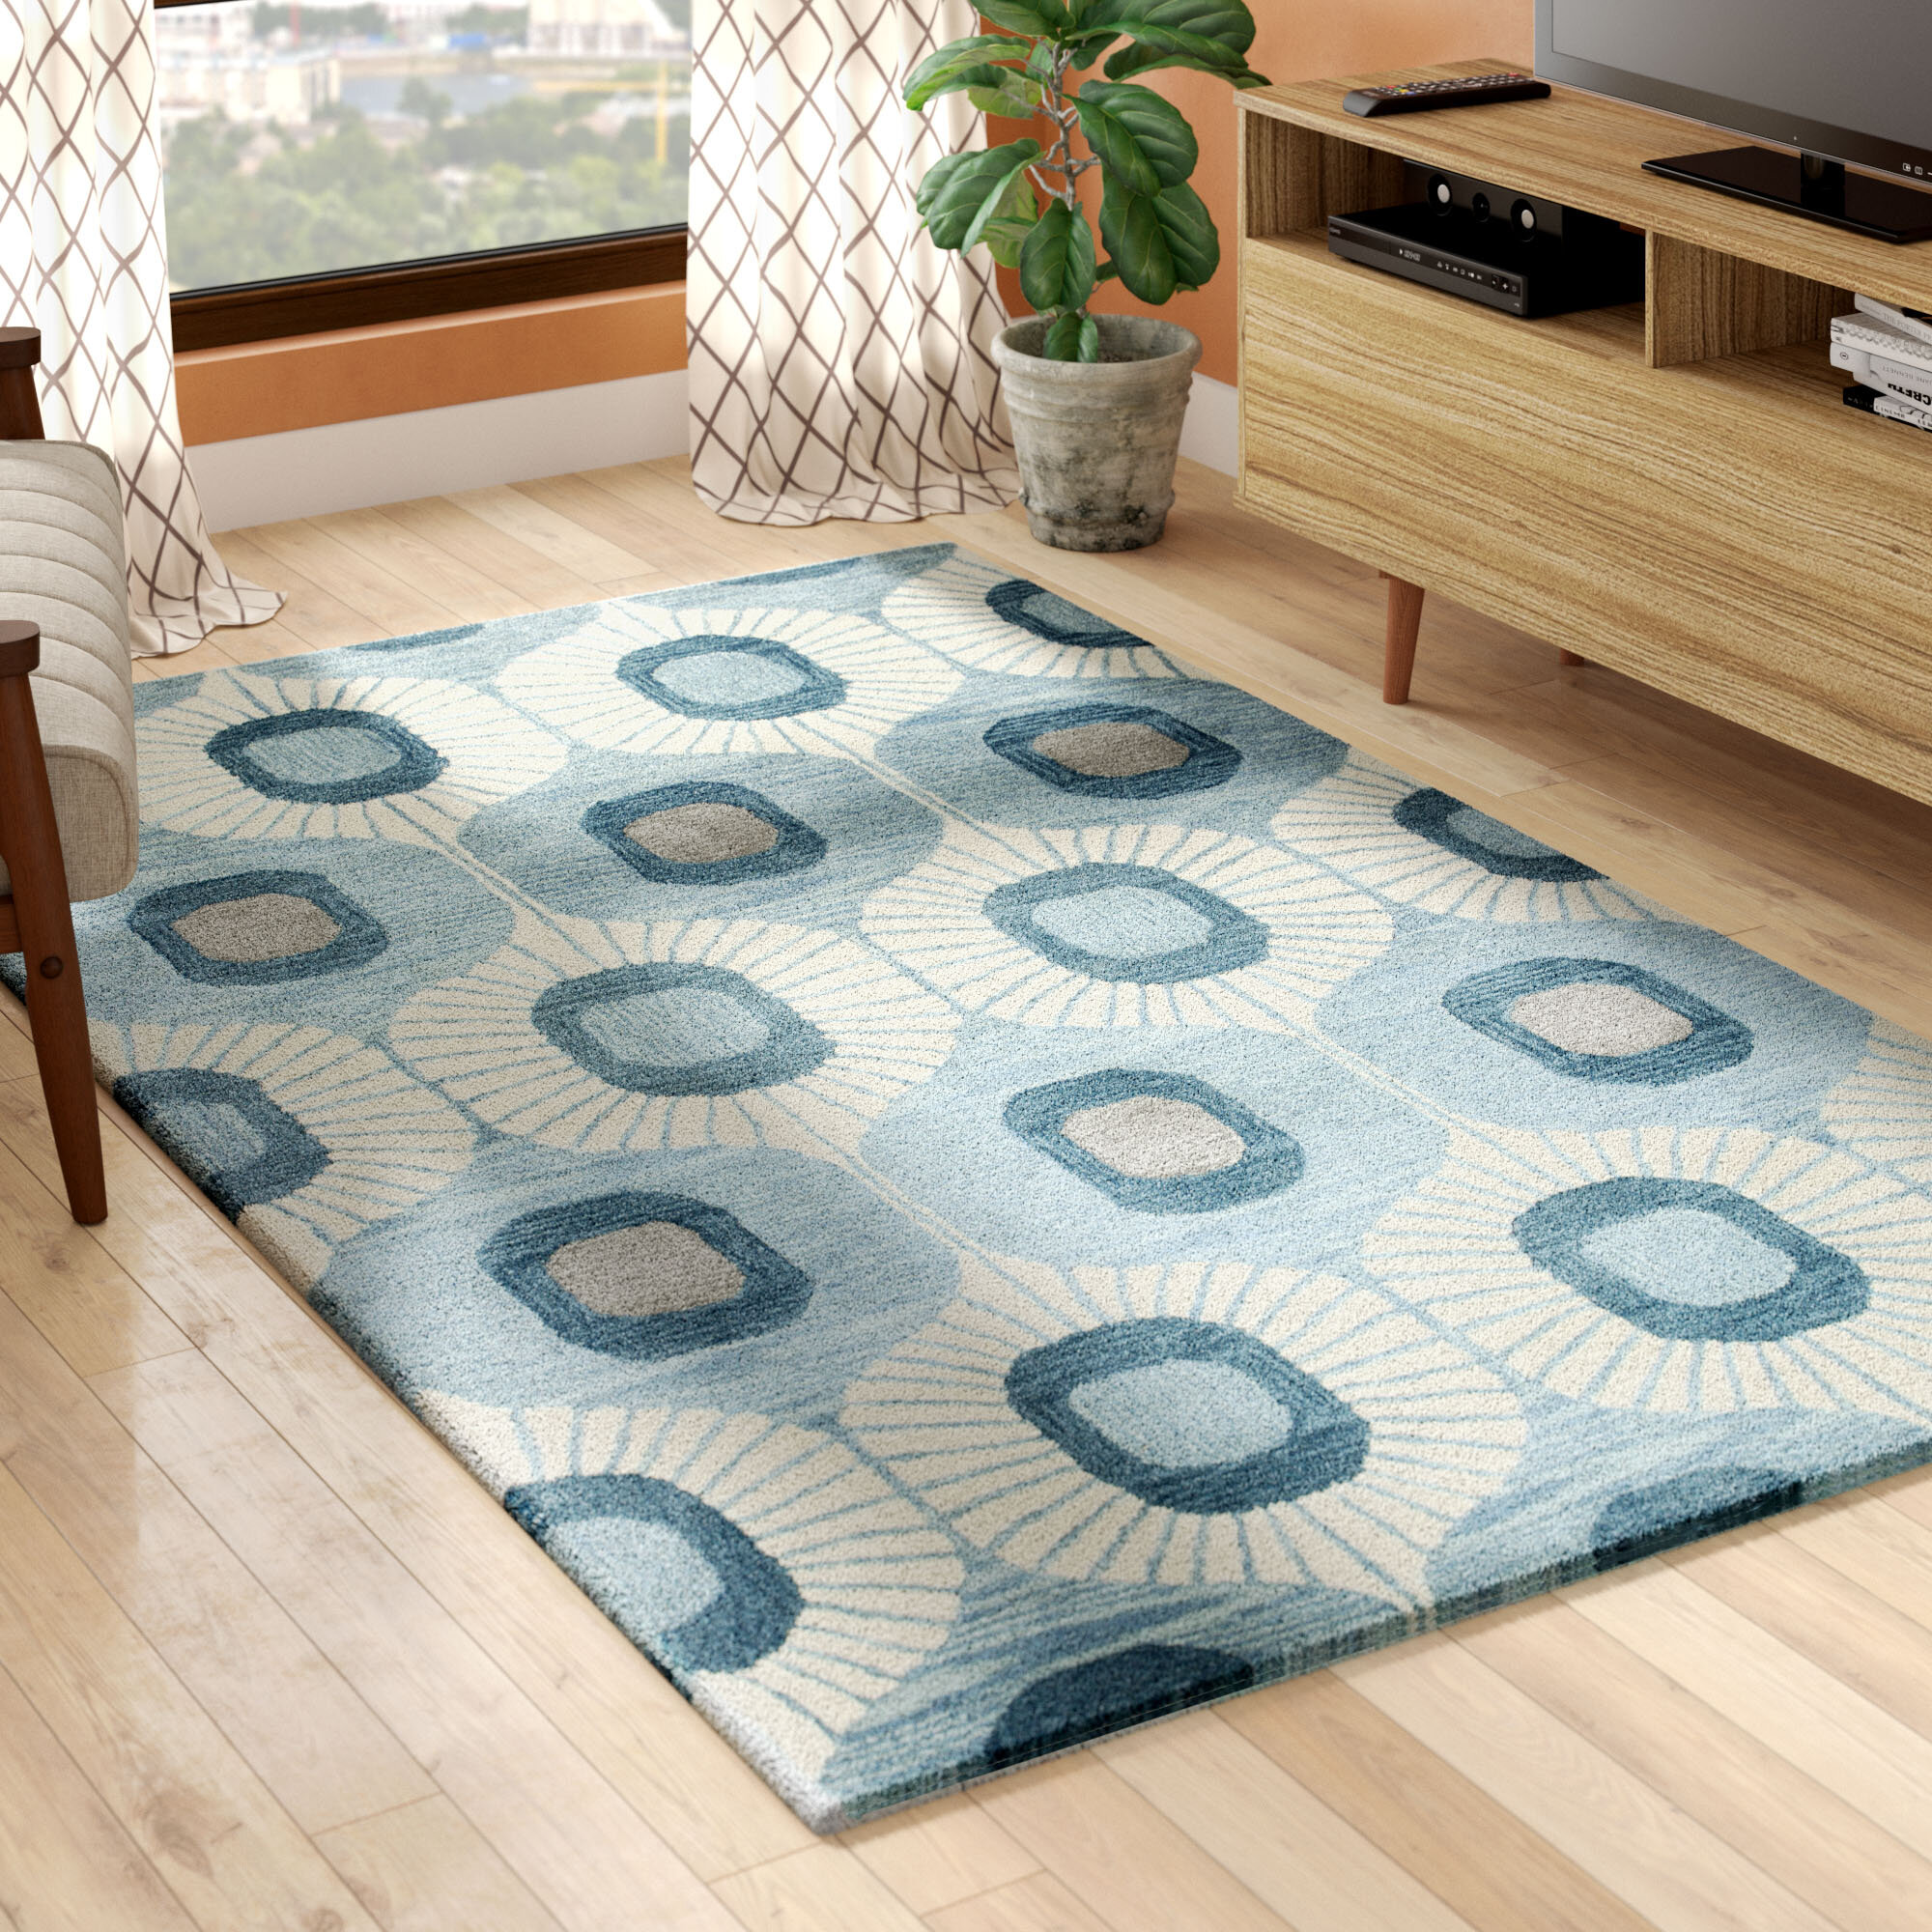 Blue Wool Area Rugs You Ll Love In 2021 Wayfair